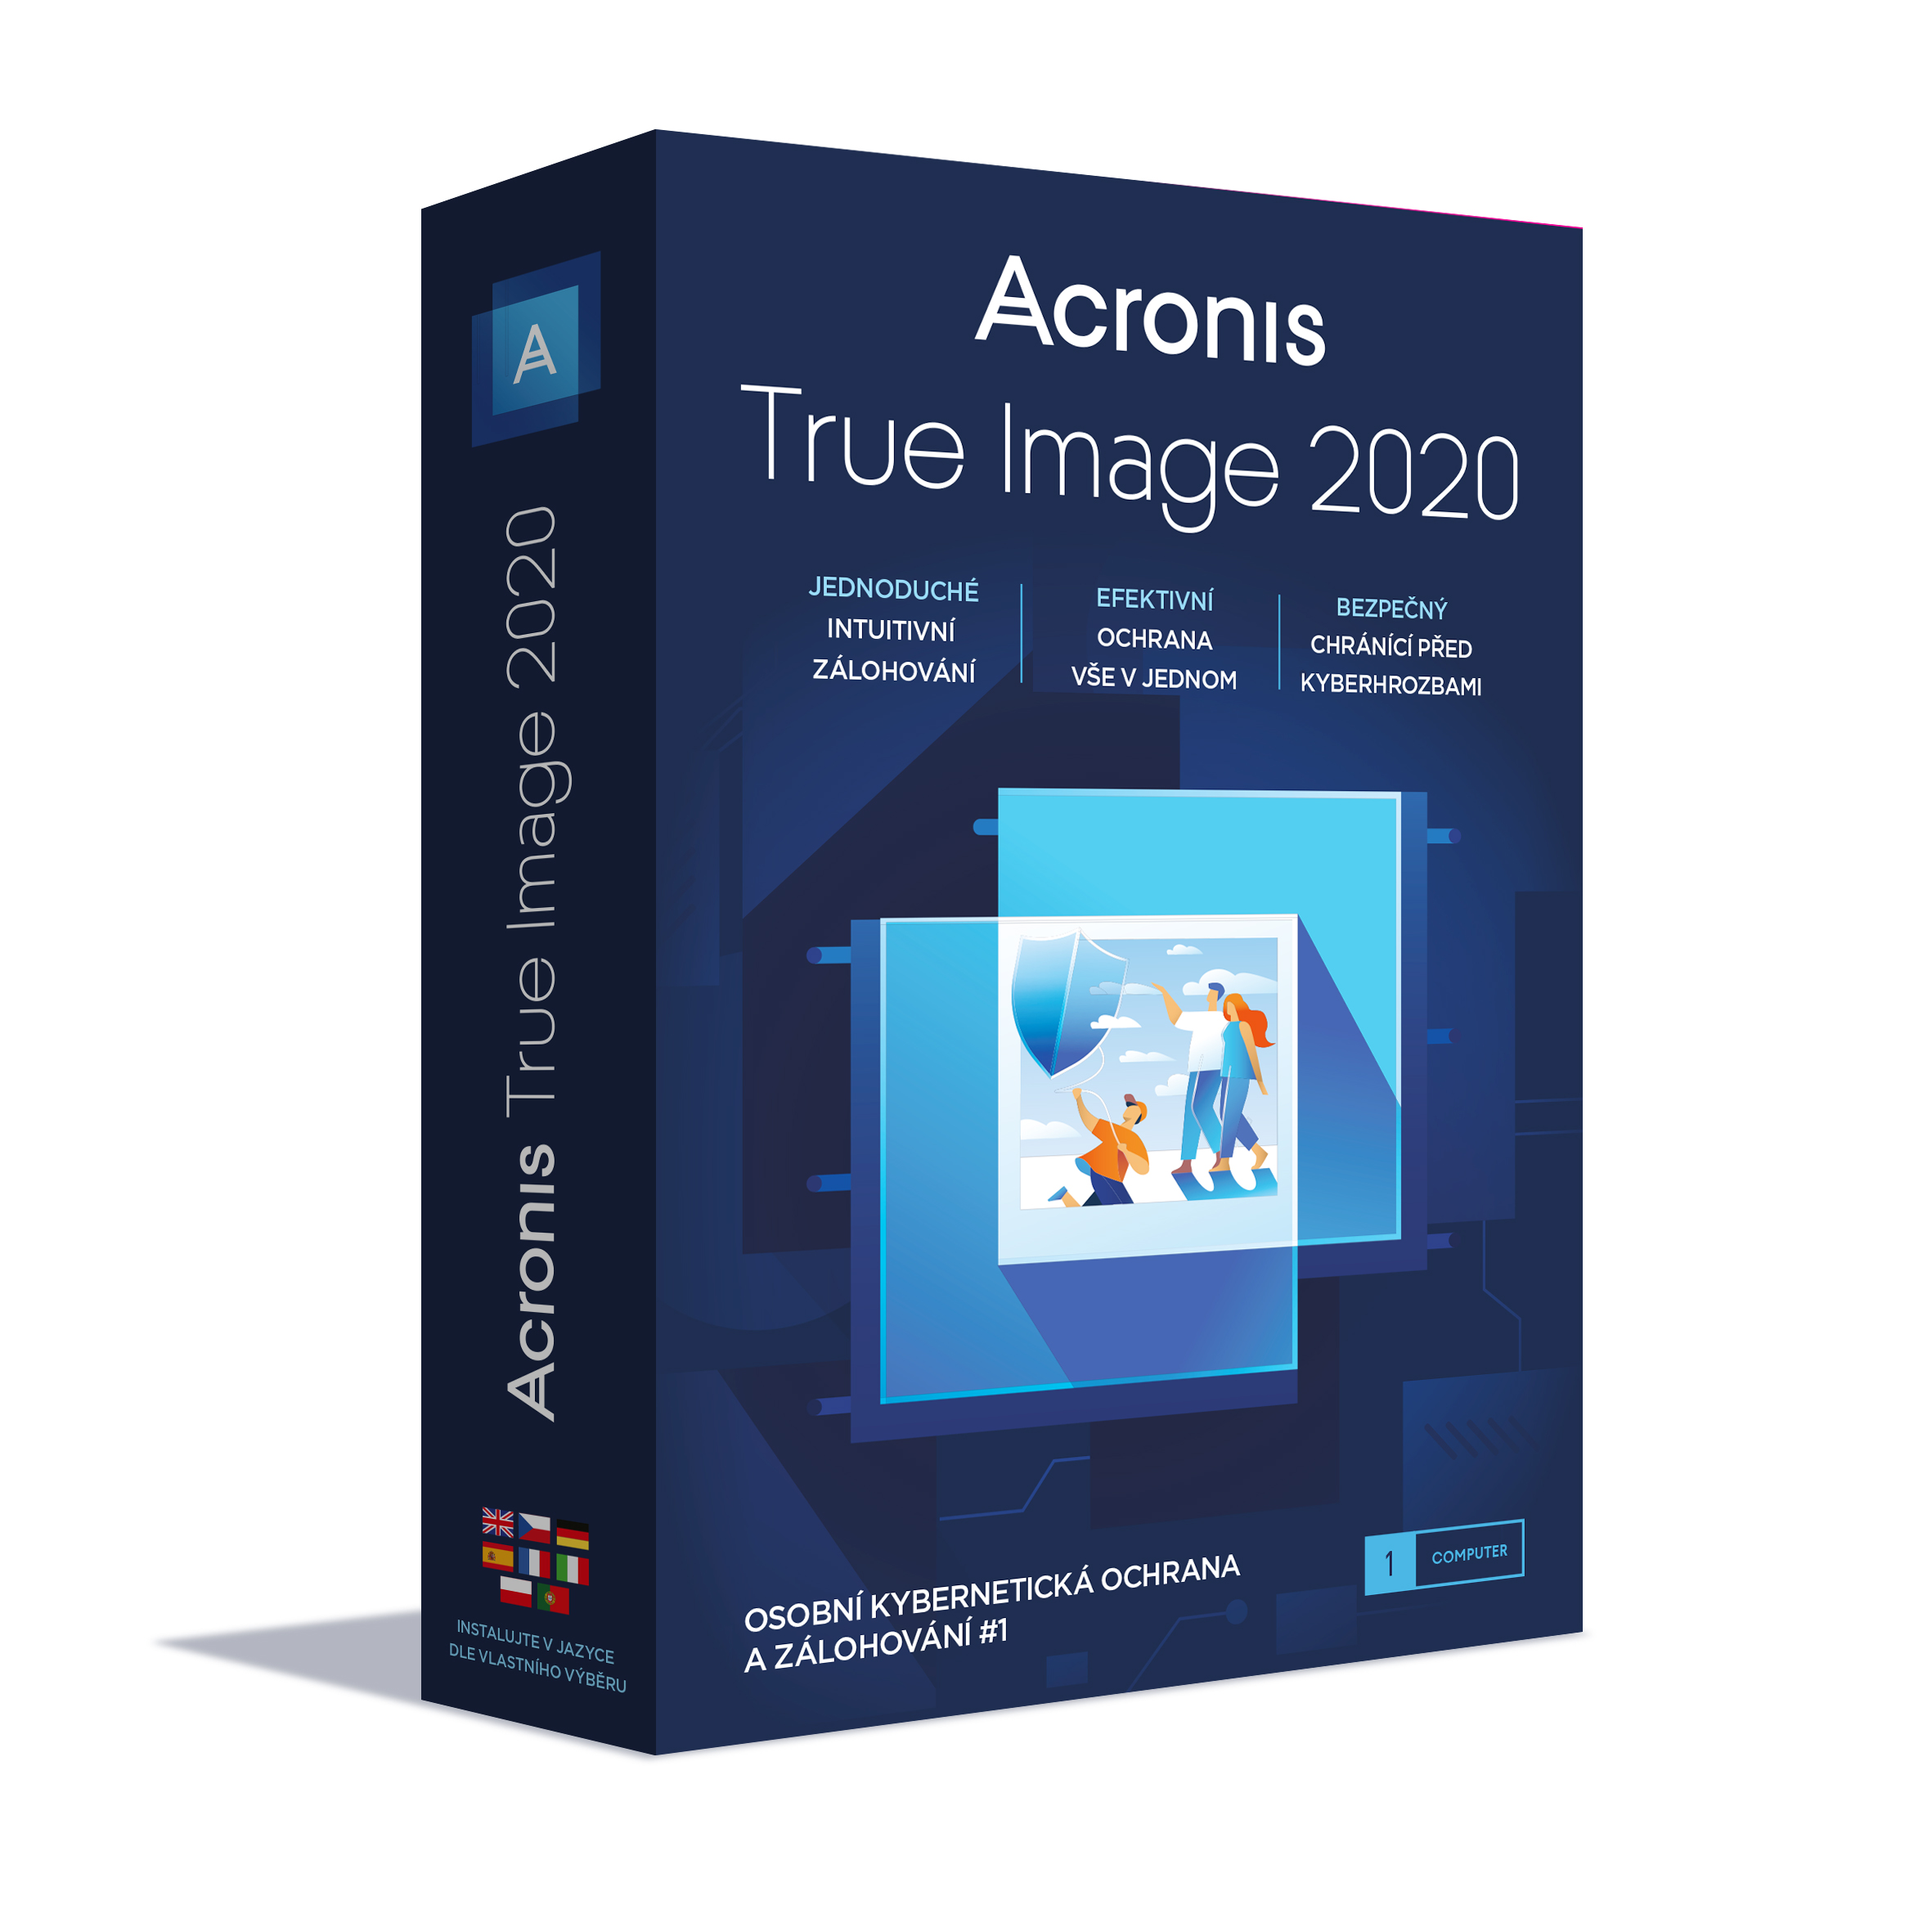 Acronis True Image 2020 - 1 Computer - BOX Upgrade